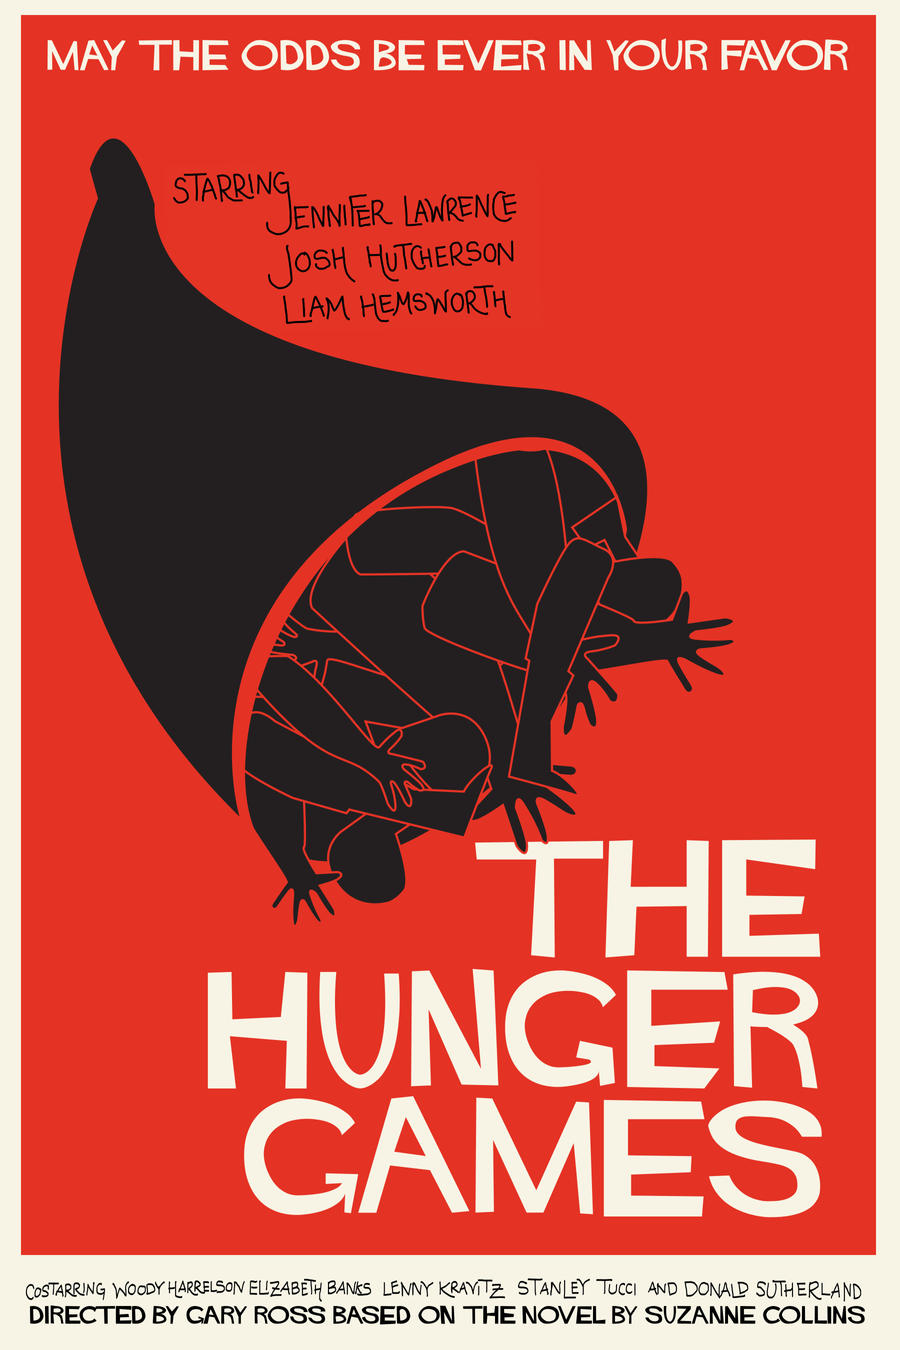 saul bass inspired hunger games poster by deathlytriforce on deviantart